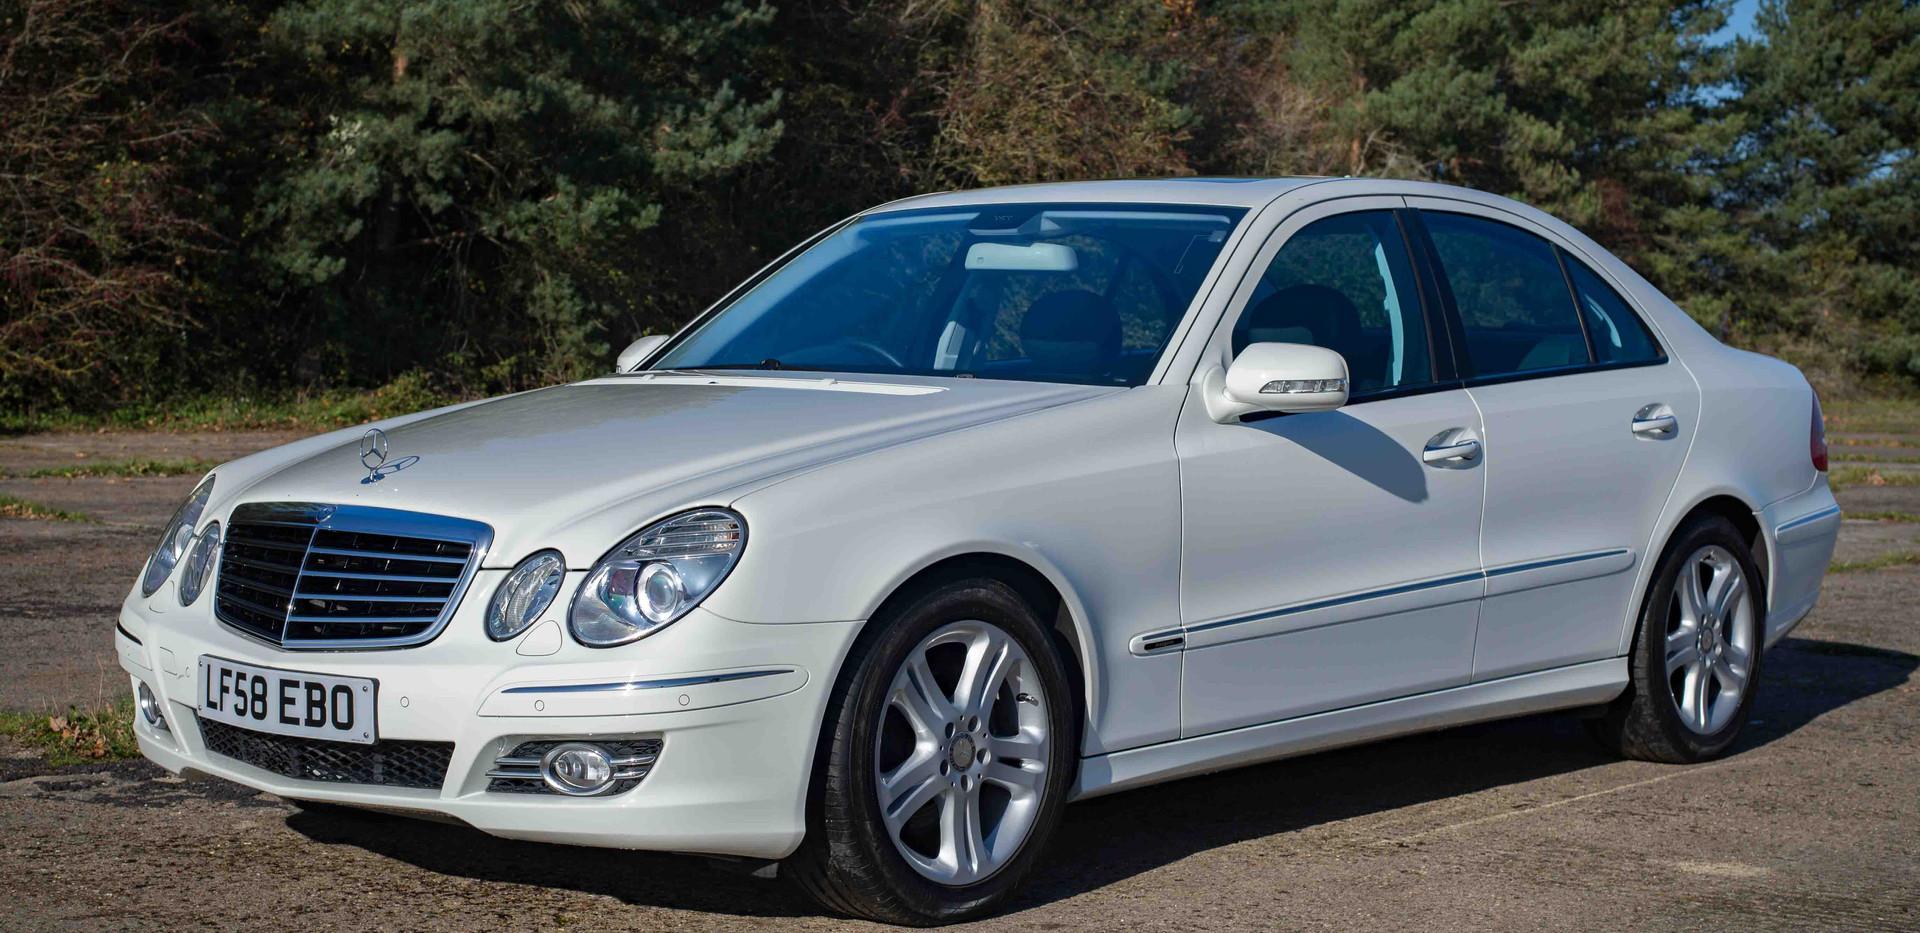 Mercedes E350 For Sale UK London  (19 of